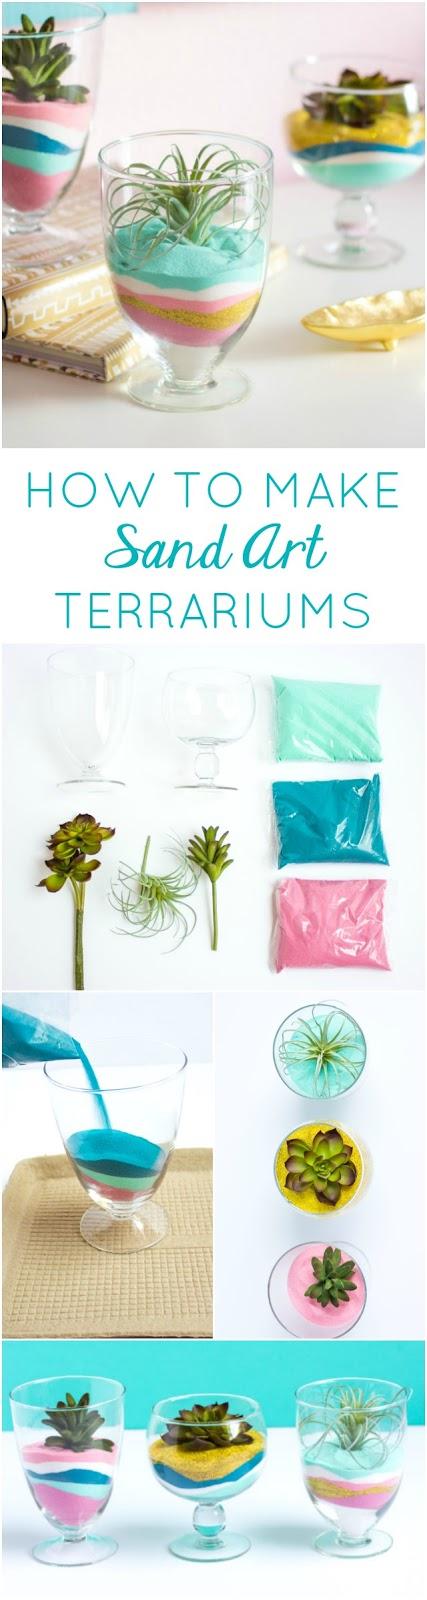 How to make DIY succulent sand art terrariums - such a pretty home decor project!